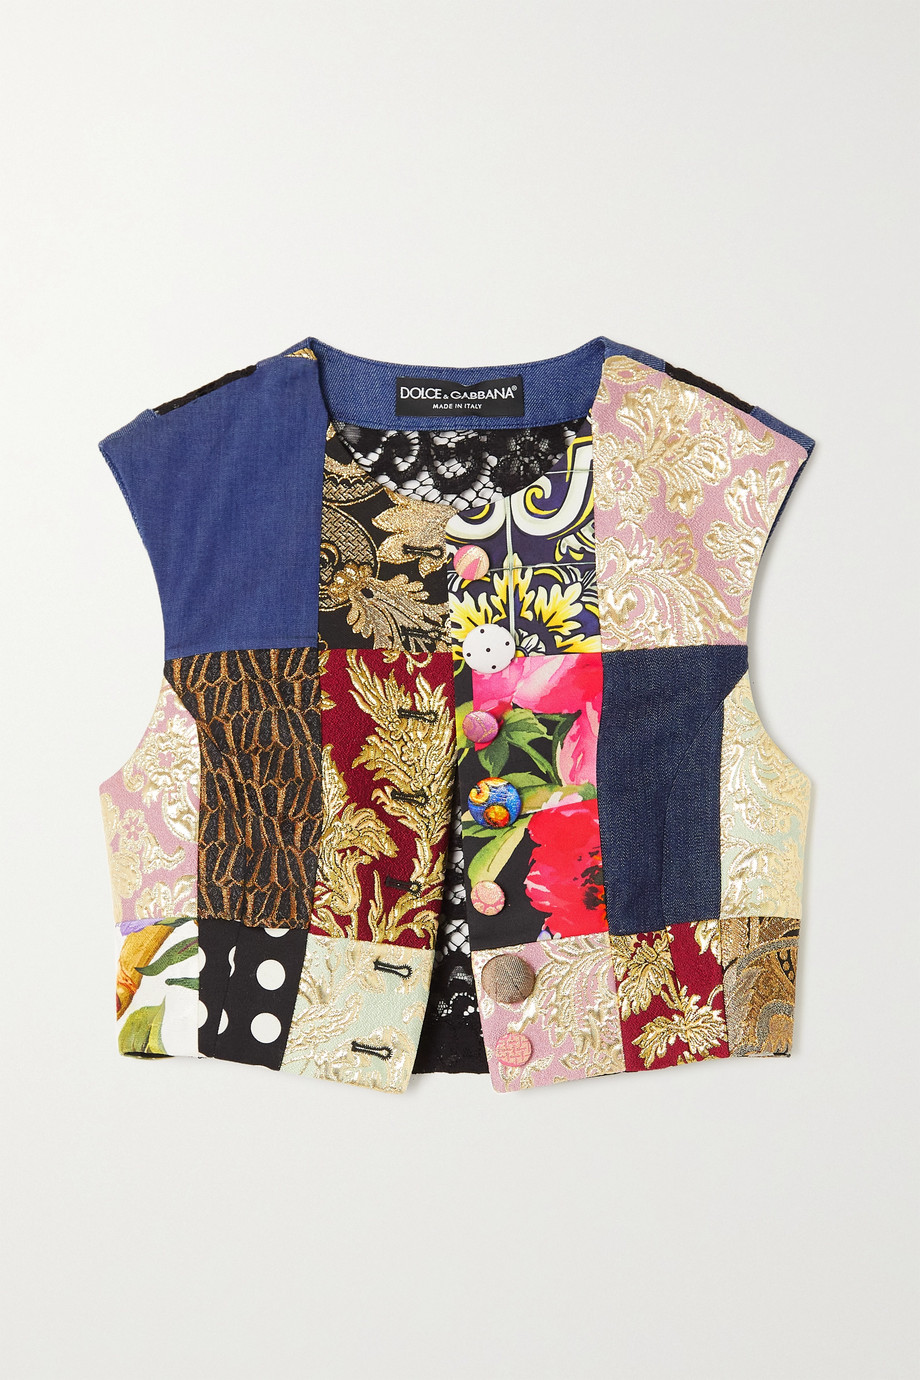 Dolce & Gabbana Gilet raccourci patchwork en jacquard, serge, jean et dentelle